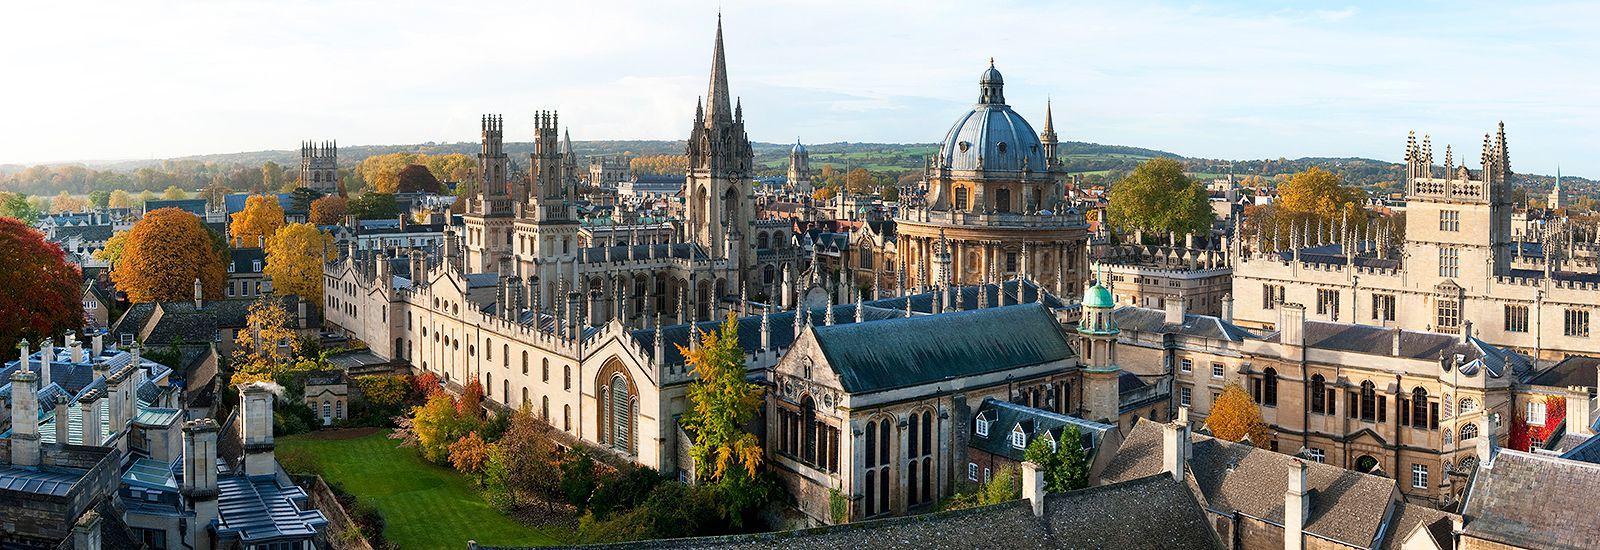 Oxford, courtesyof Oxford University